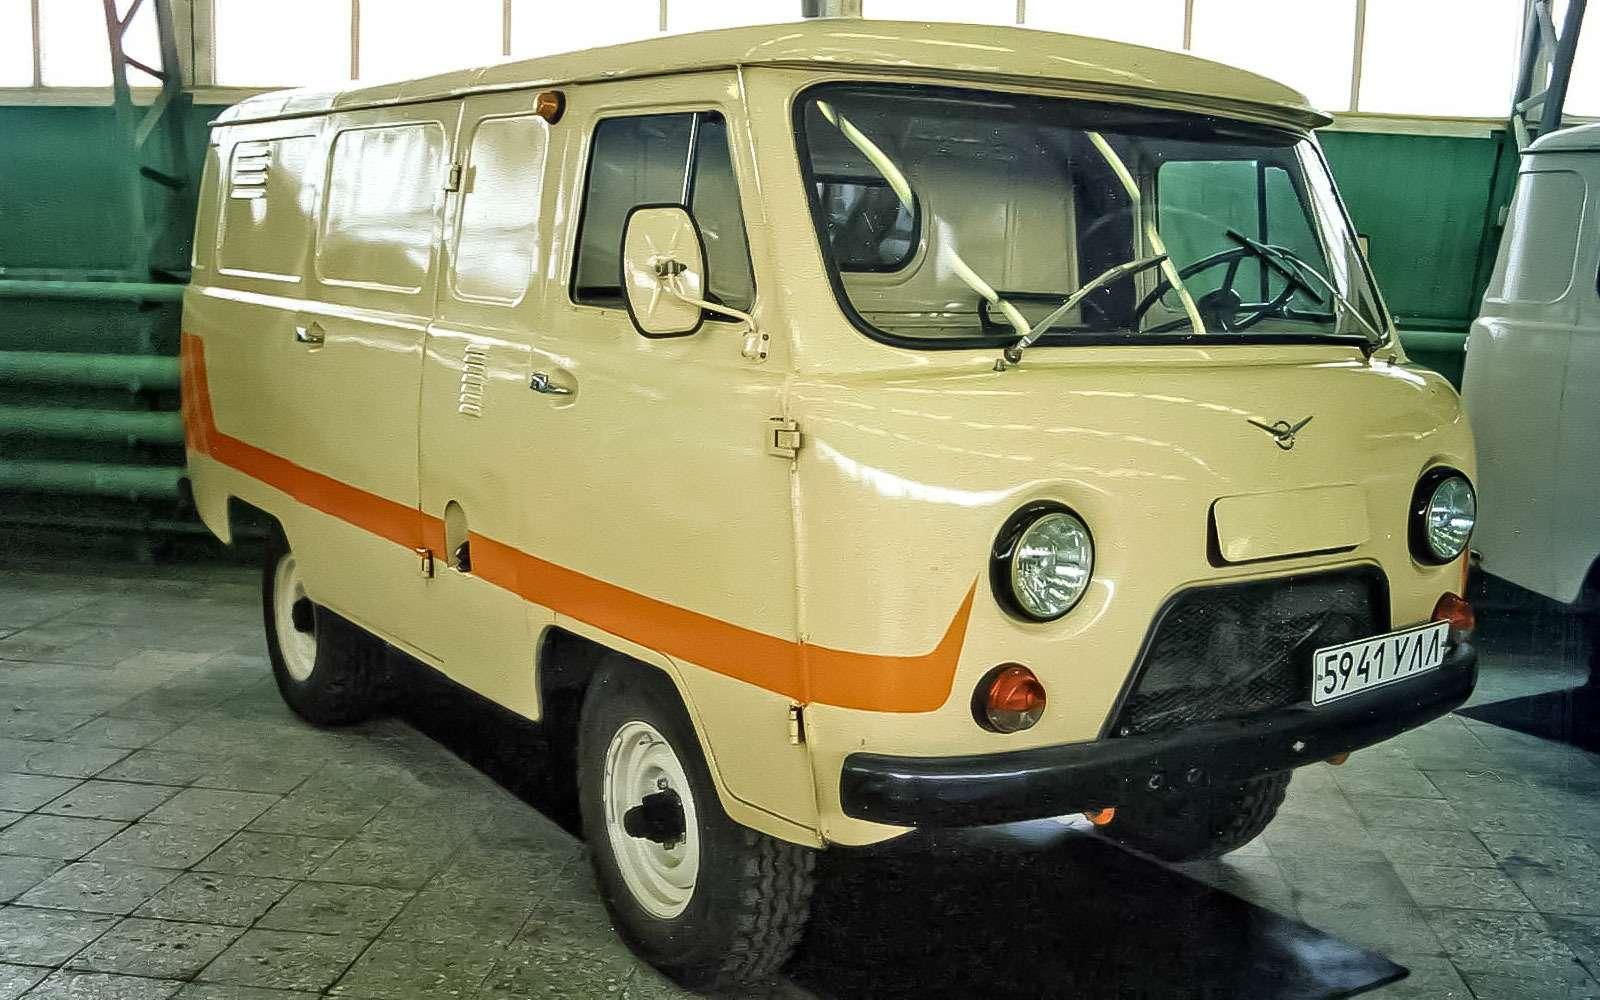 УАЗ-452, УАЗ-3741и УАЗ-3303